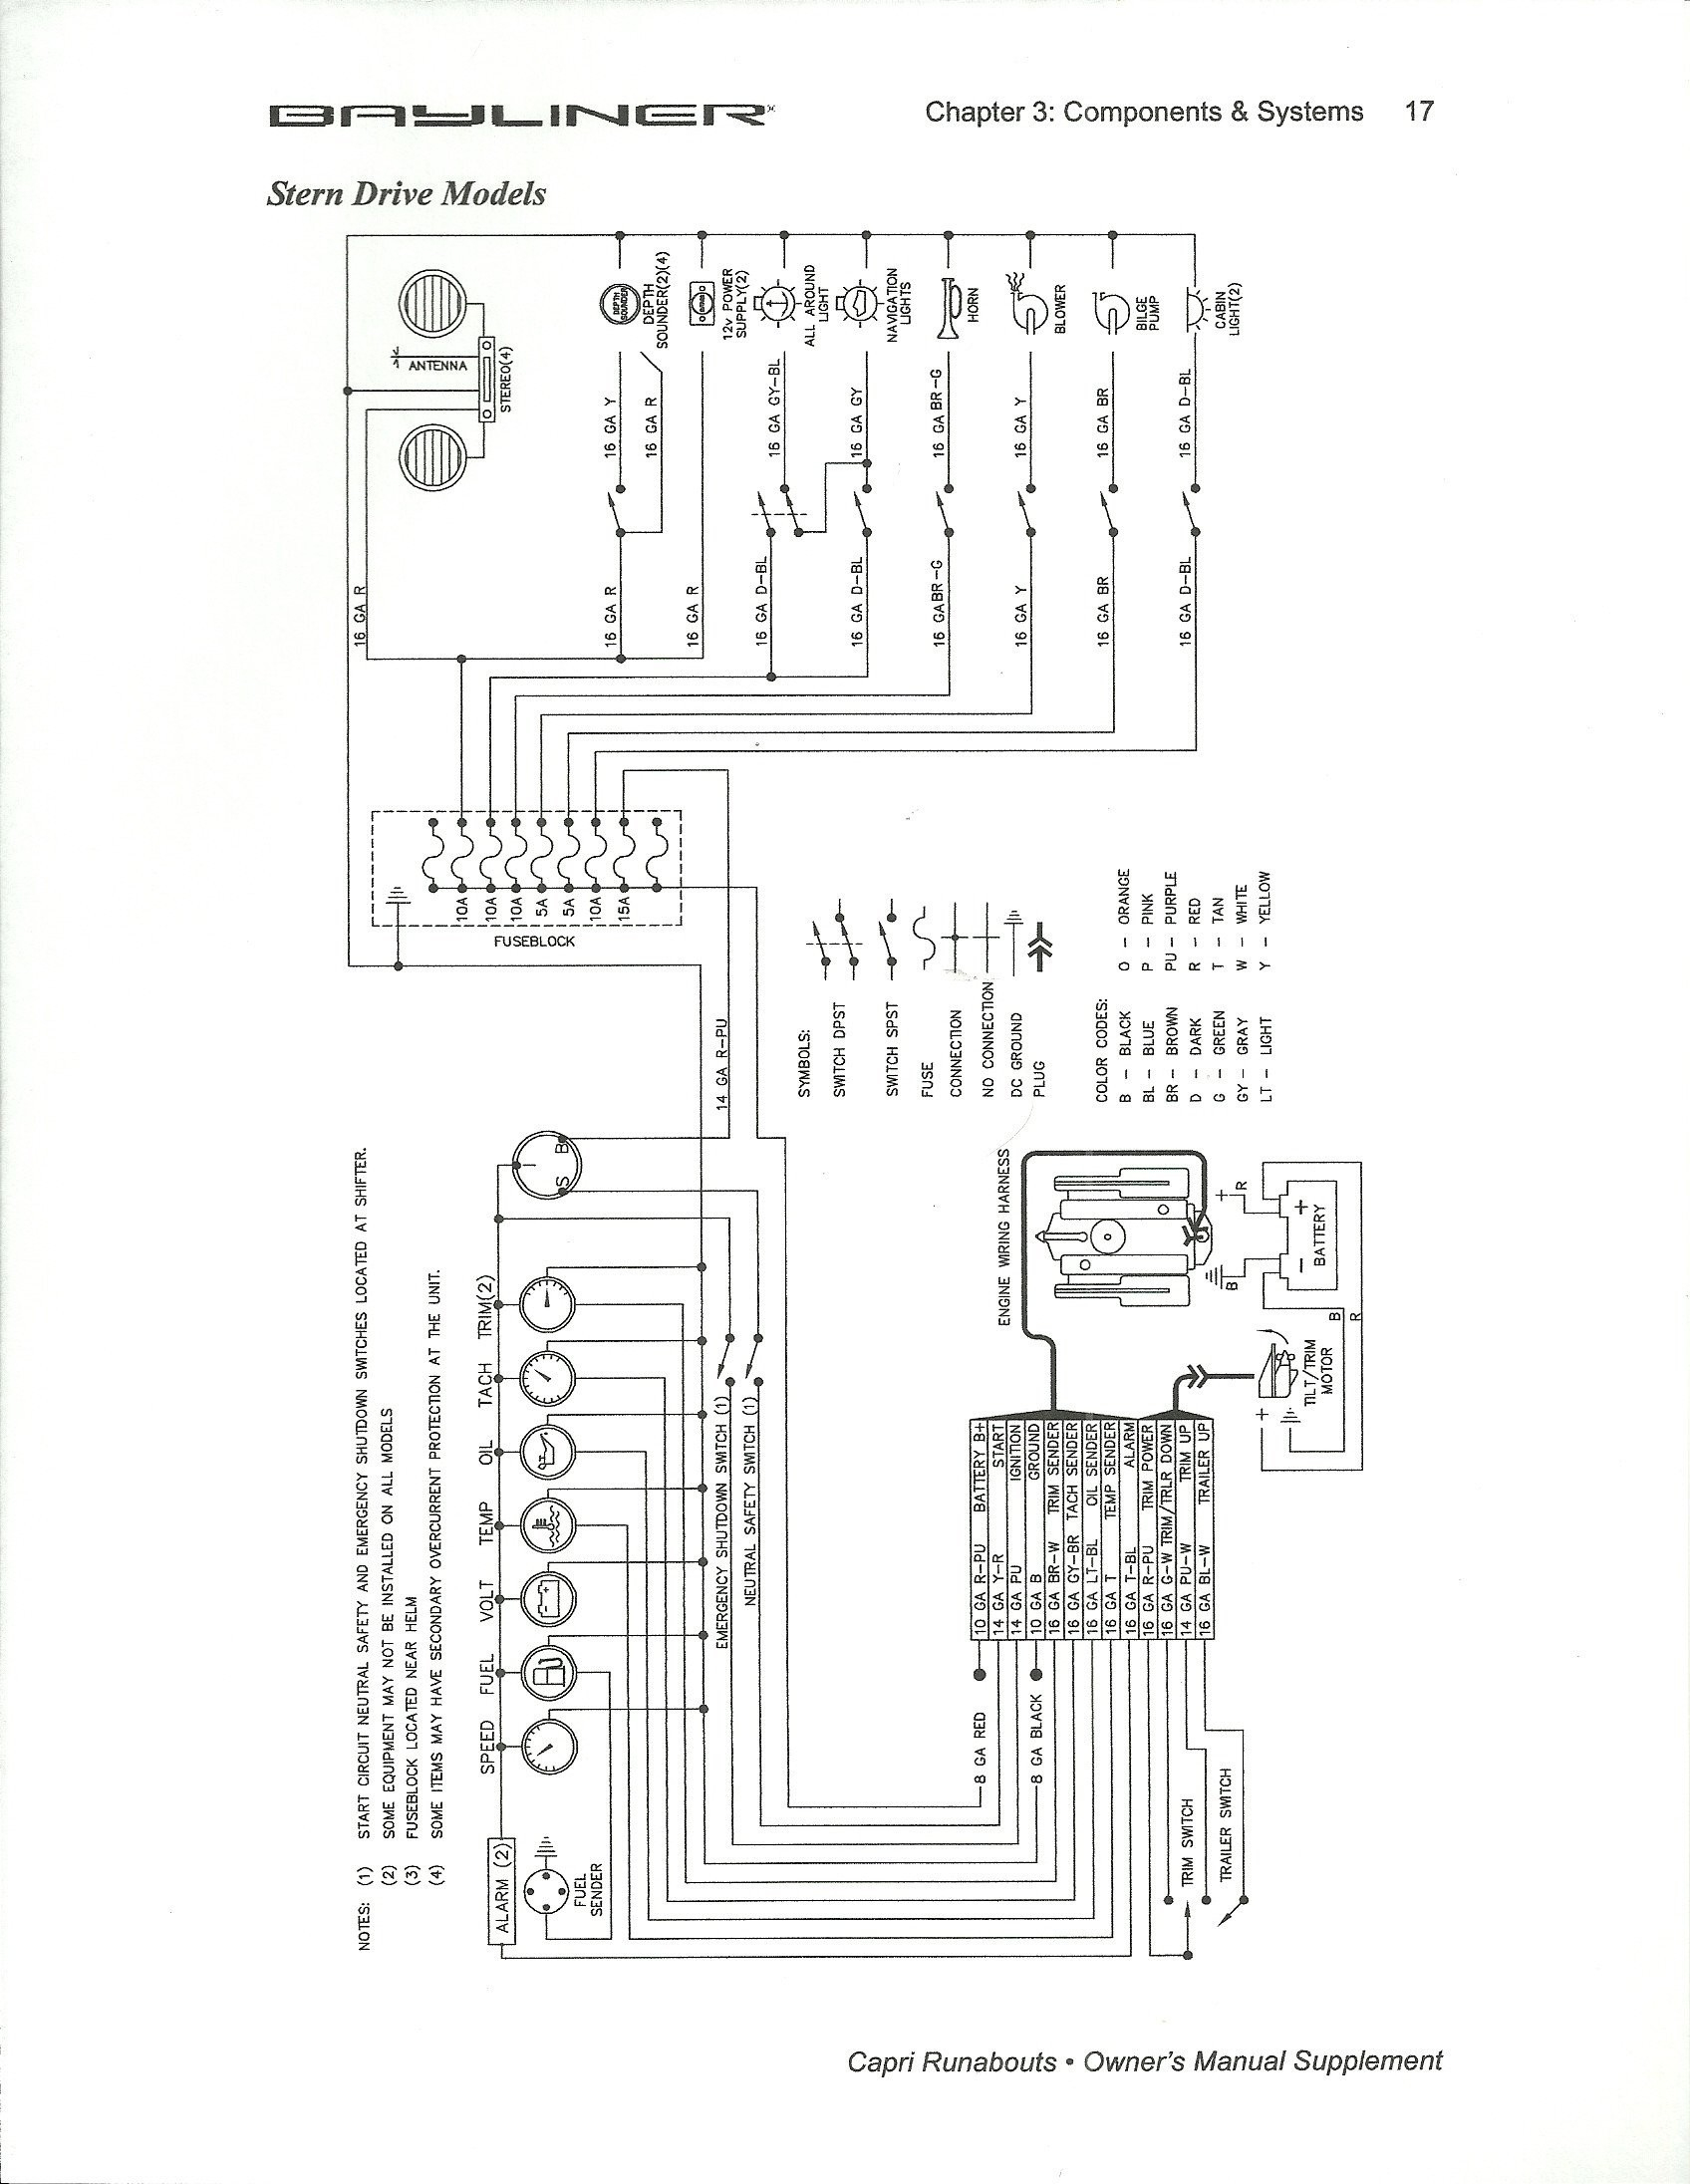 Traeger Parts Texas Schematic | Wiring Diagram - Traeger Wiring Diagram